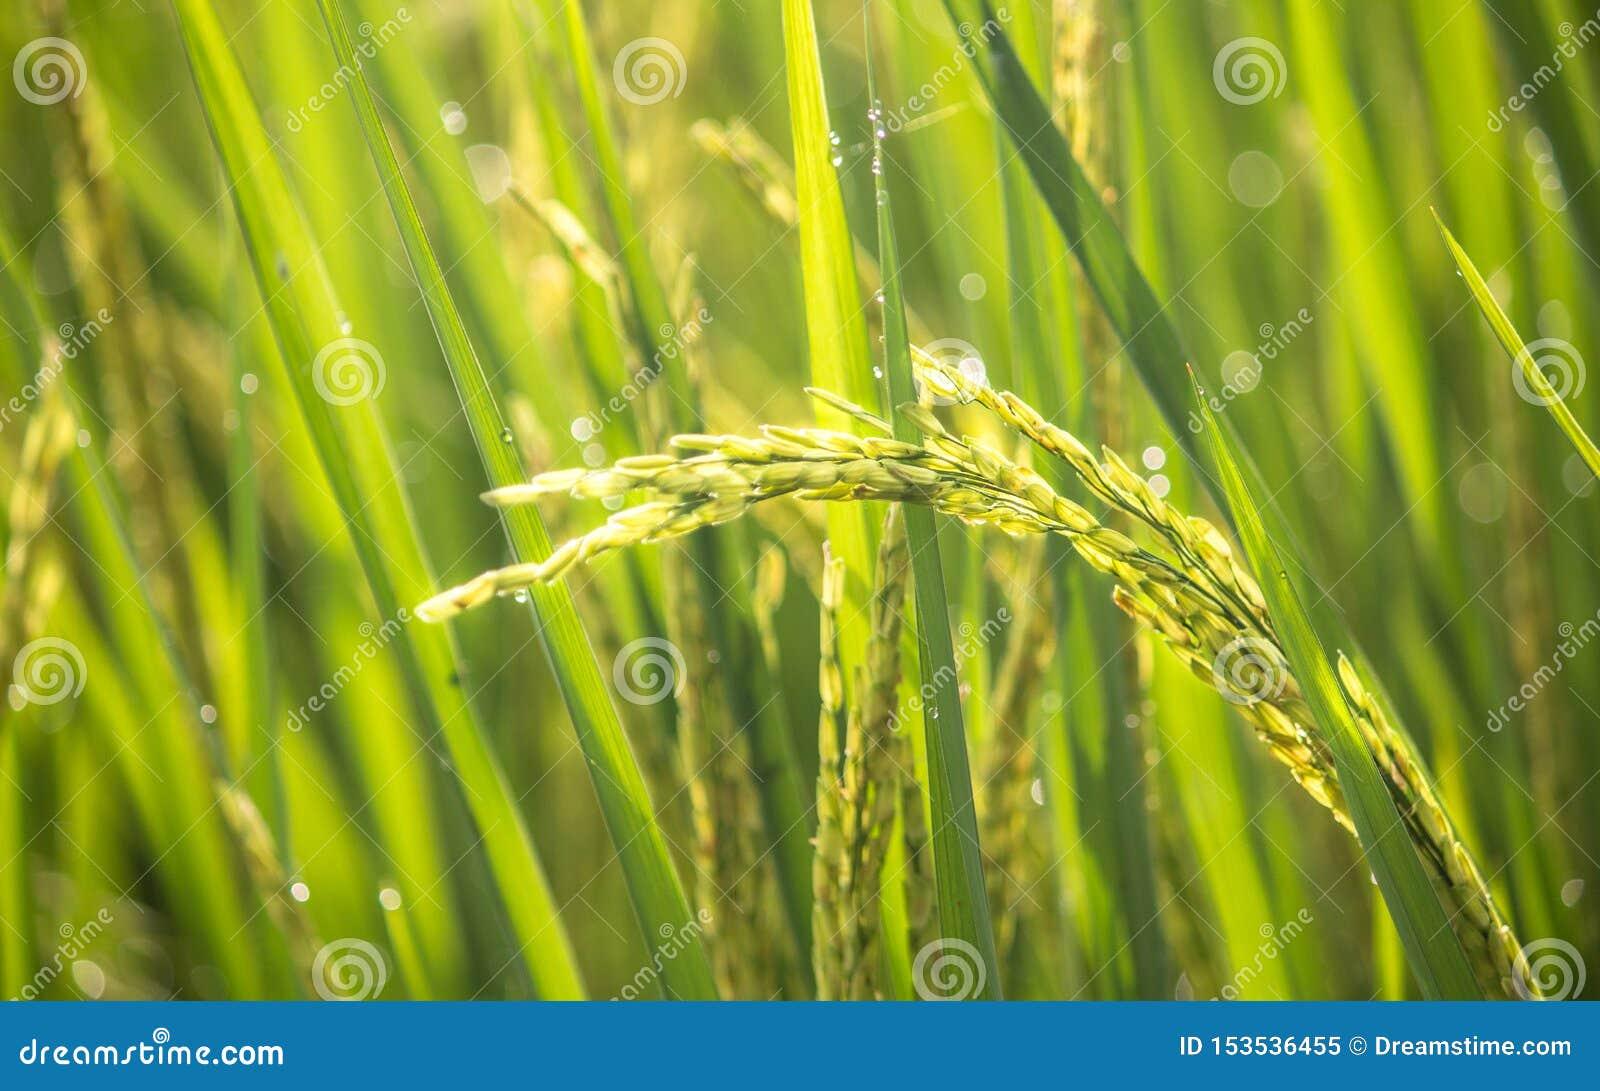 Paddy rice crop